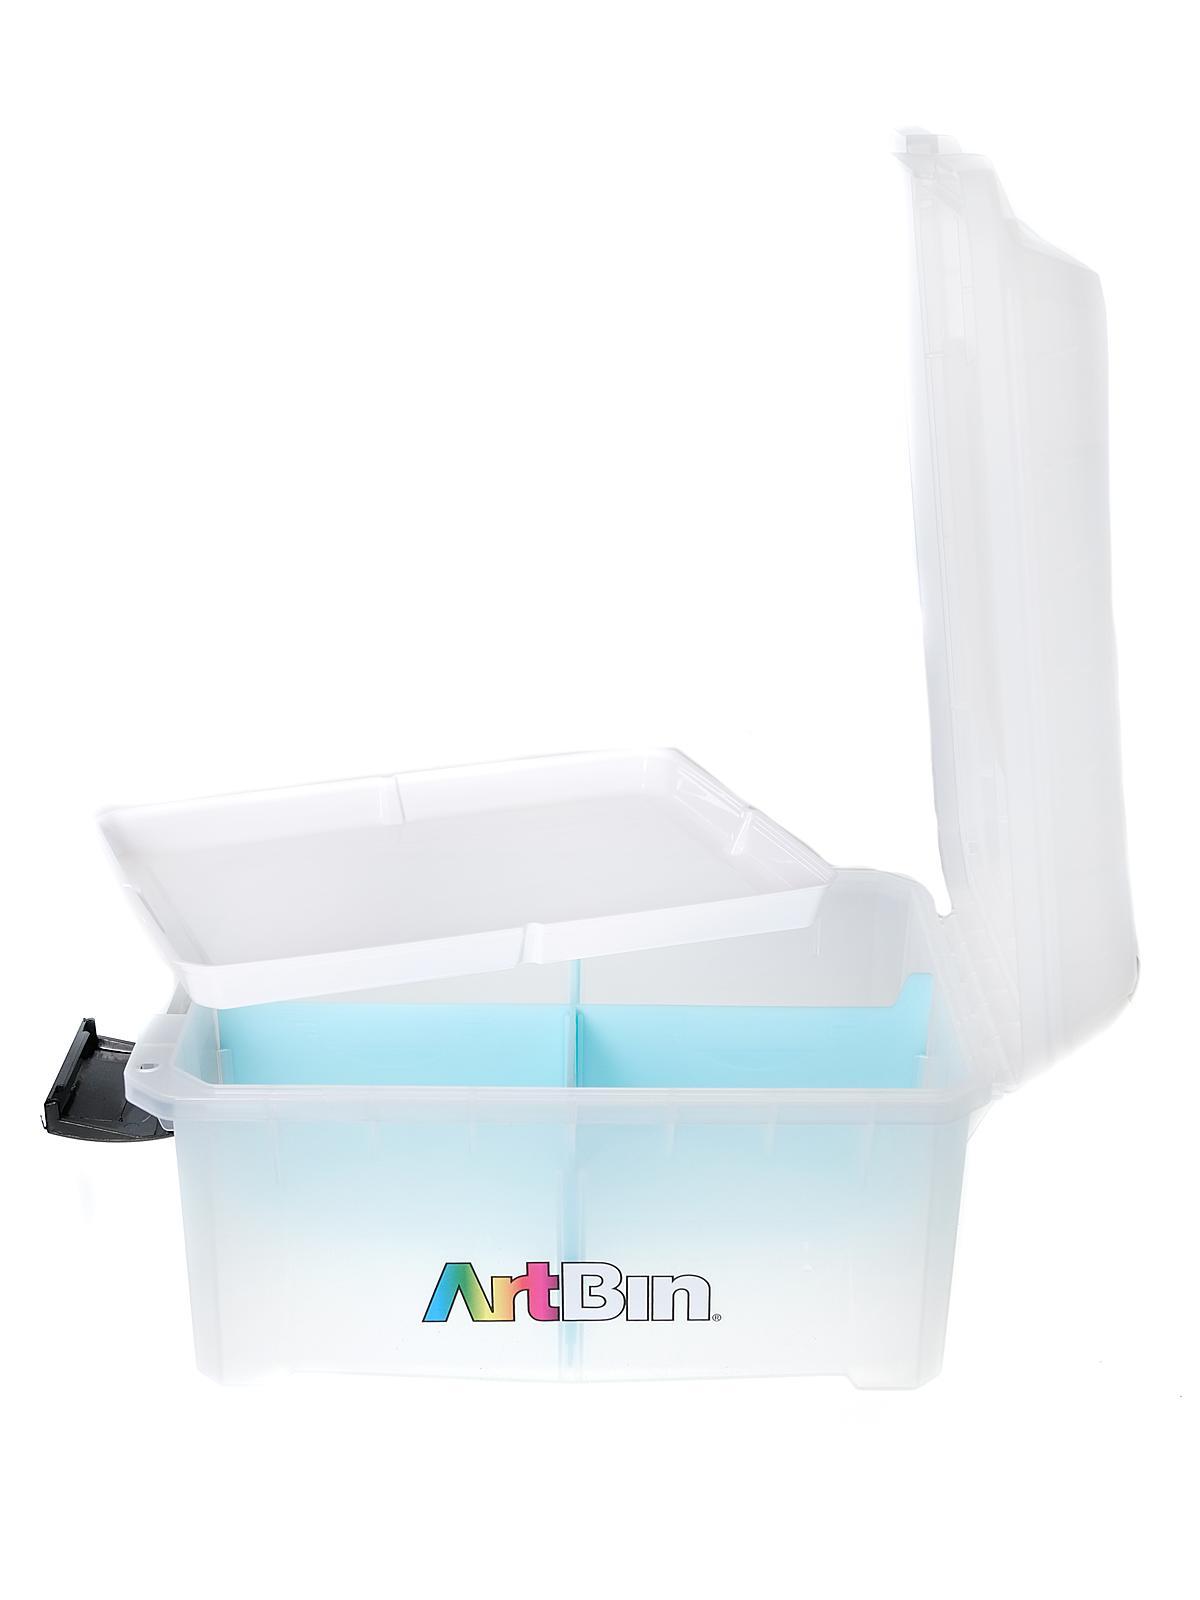 Sidekick Cube With Open Tray